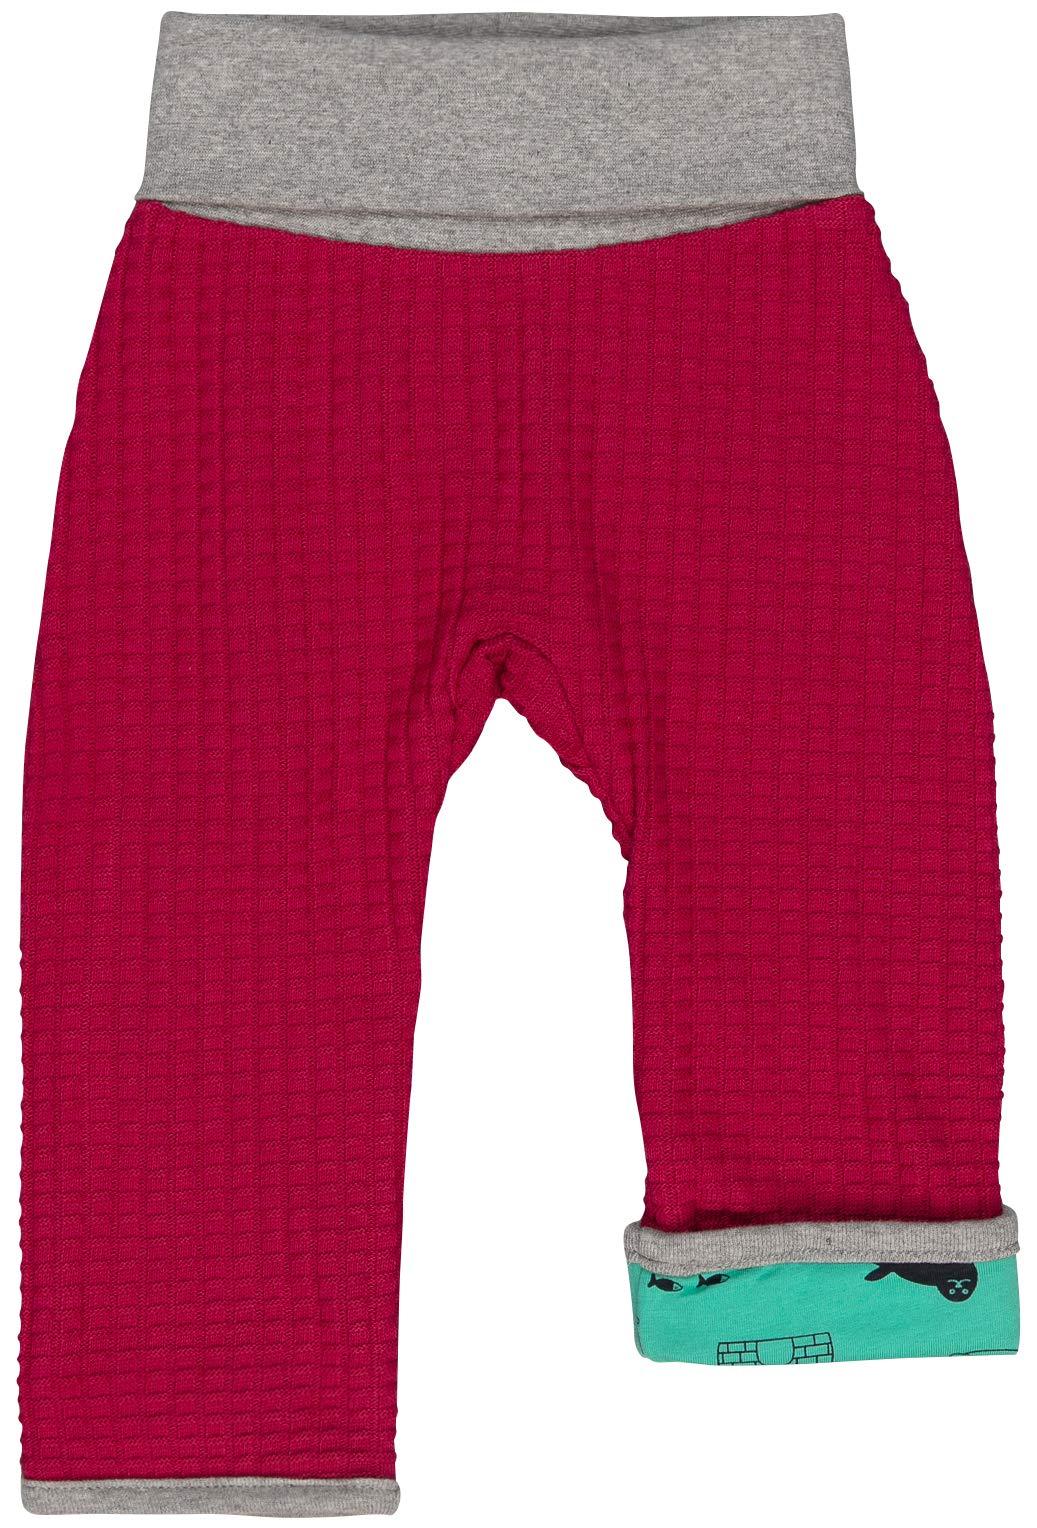 loud + proud Wendehose Strick Aus Bio Baumwolle, Gots Zertifiziert Pantalones para Bebés 1